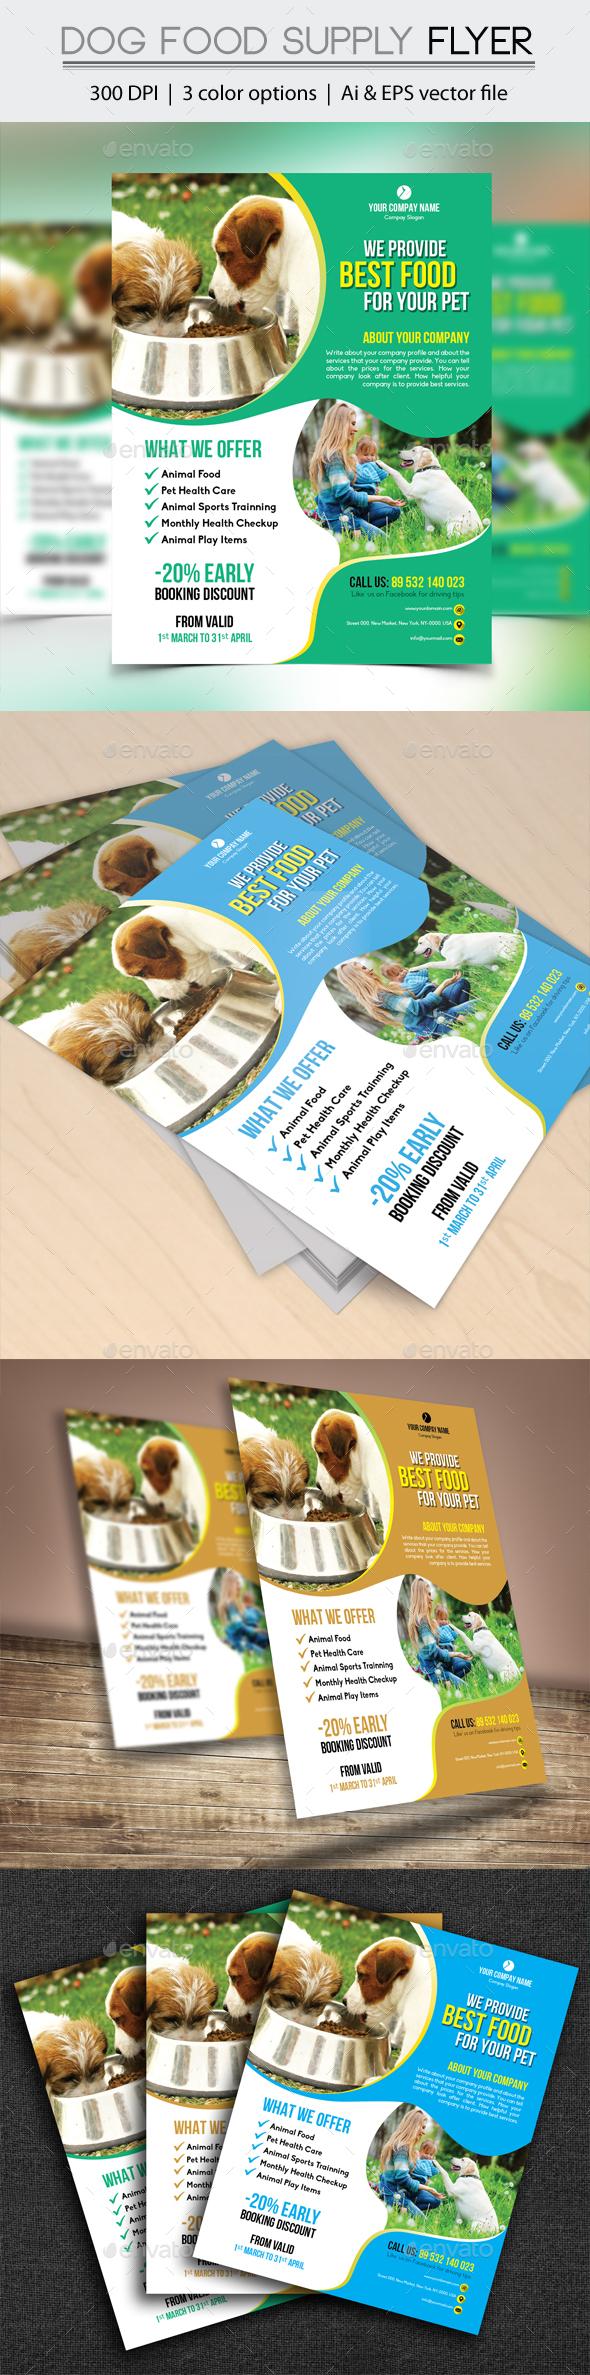 Dog Food Supply Flyer